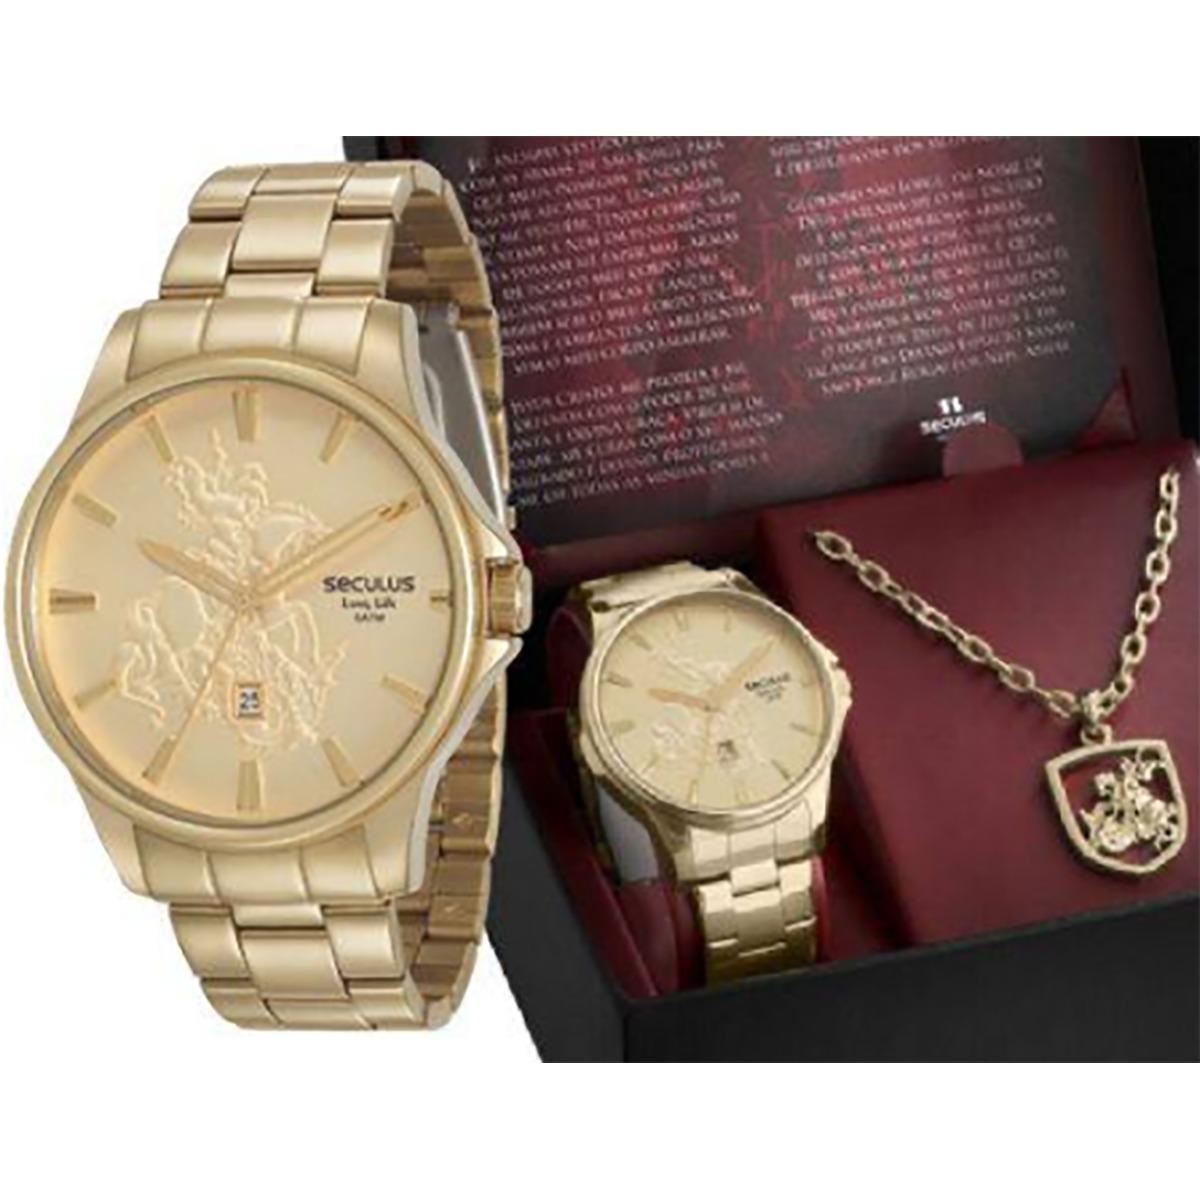 b1232d42632 Relógio Seculus Masculino São Jorge 28933gpskda1k1 - R  380